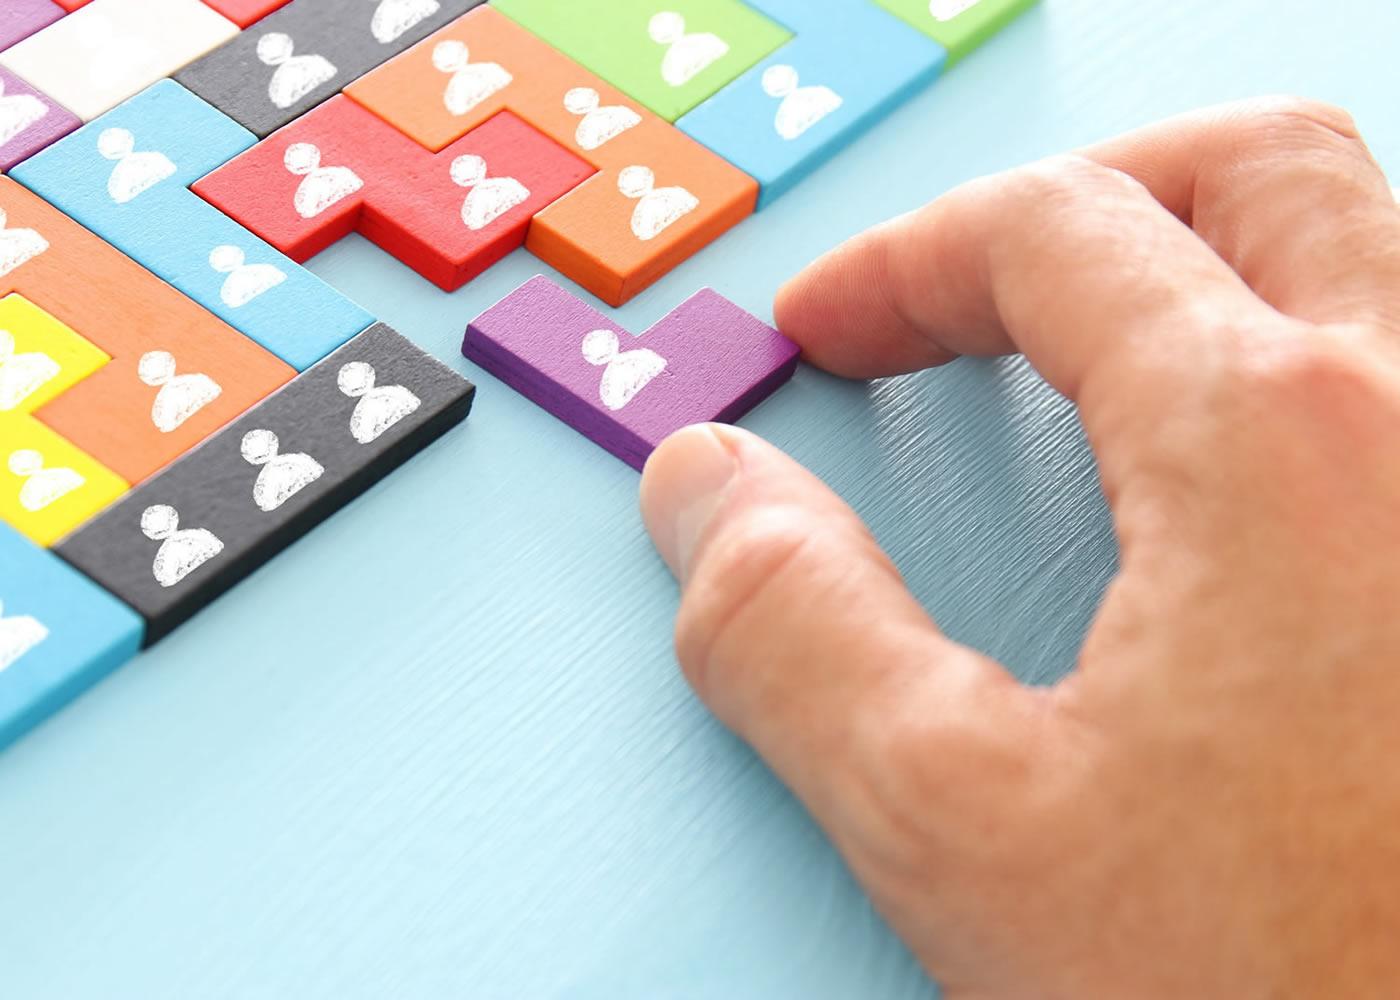 naem-2018-qanda-image-tangram-puzzle-blocks-people-icons-700x500